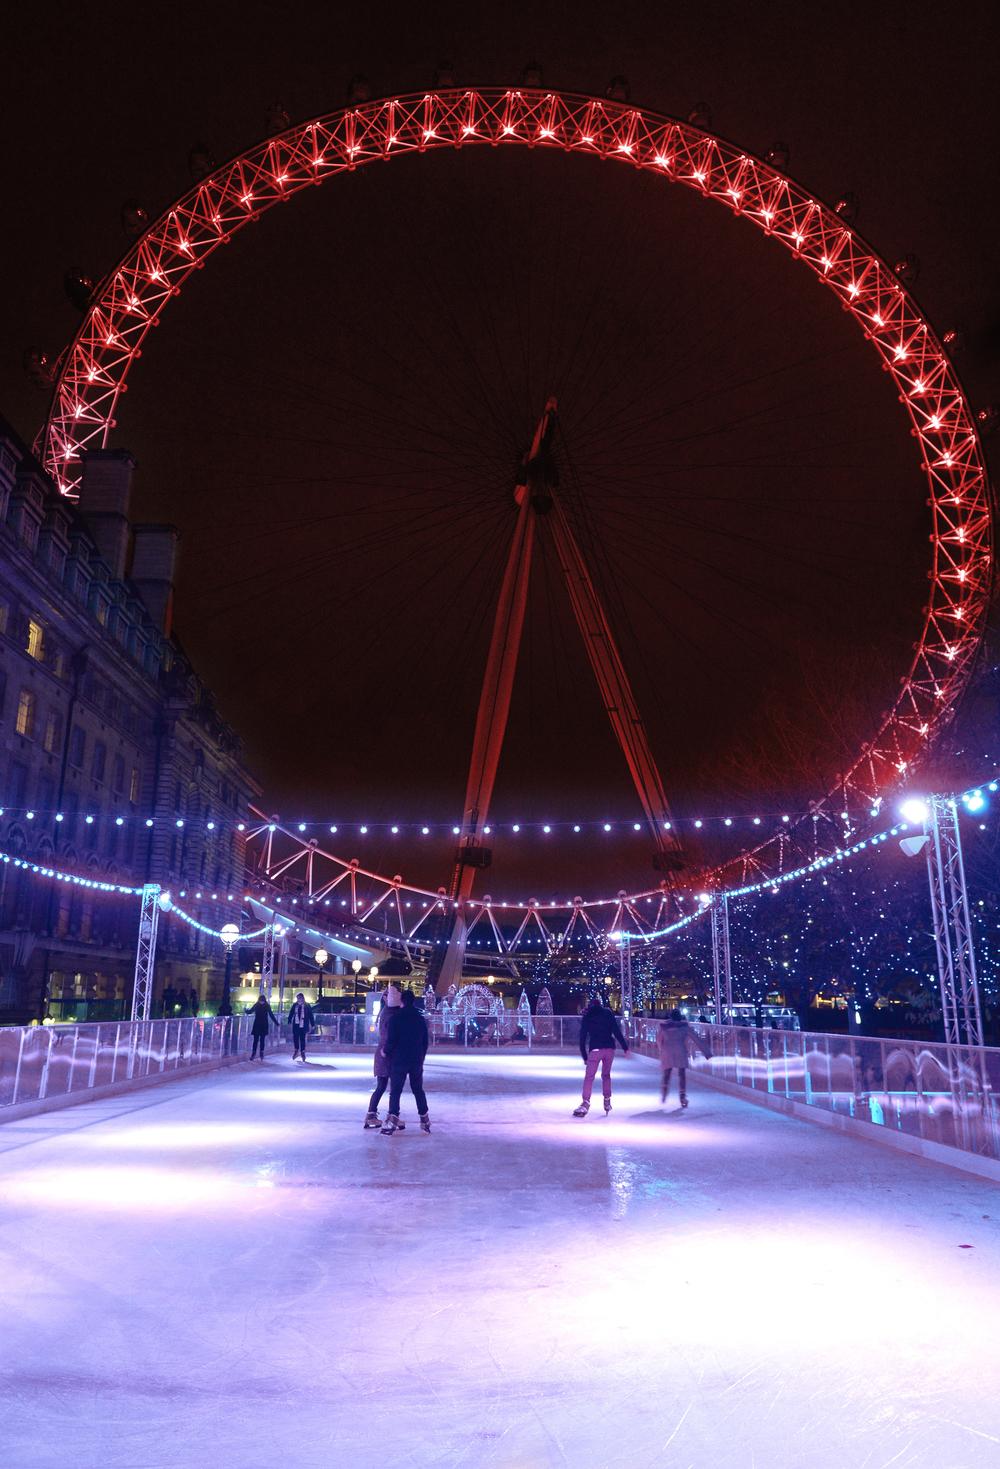 Eyeskate ice rink at the London Eye